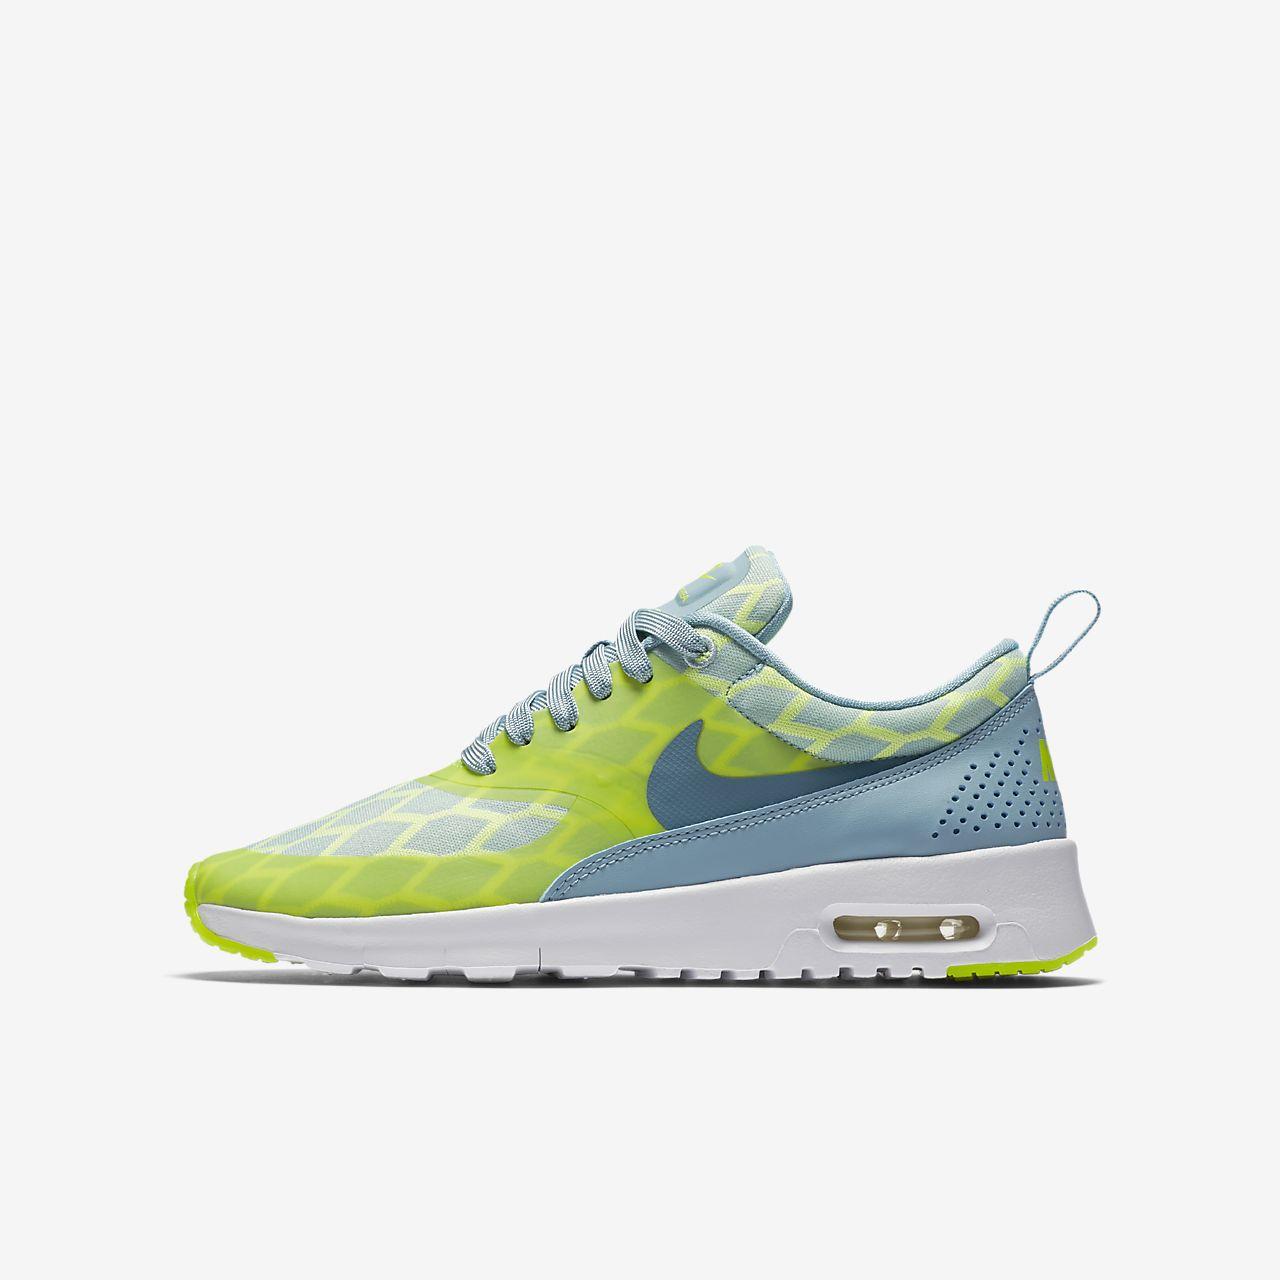 Nike Air Max 400 Kn U